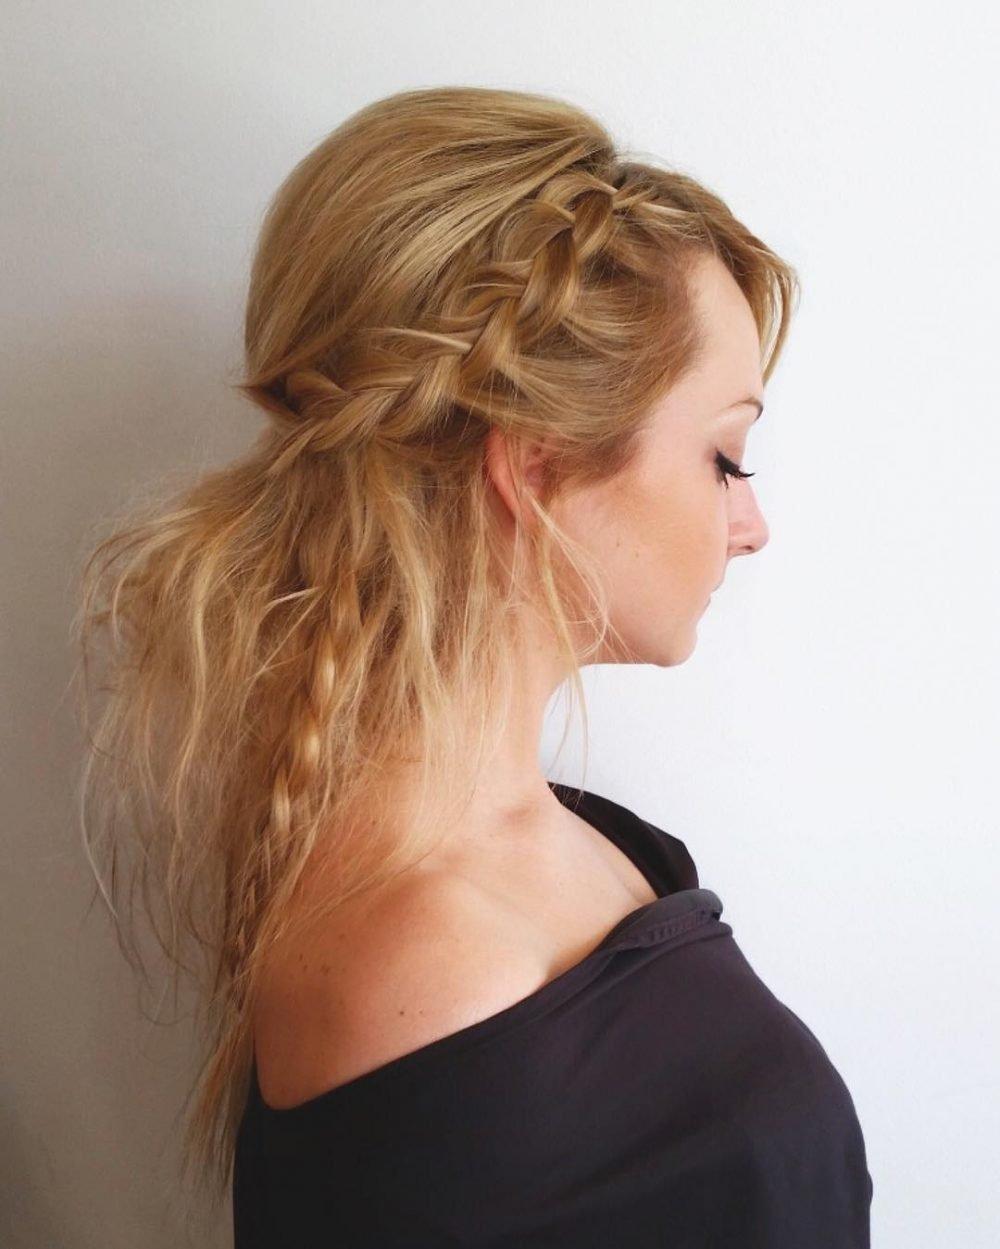 Bohemian & Natural hairstyle